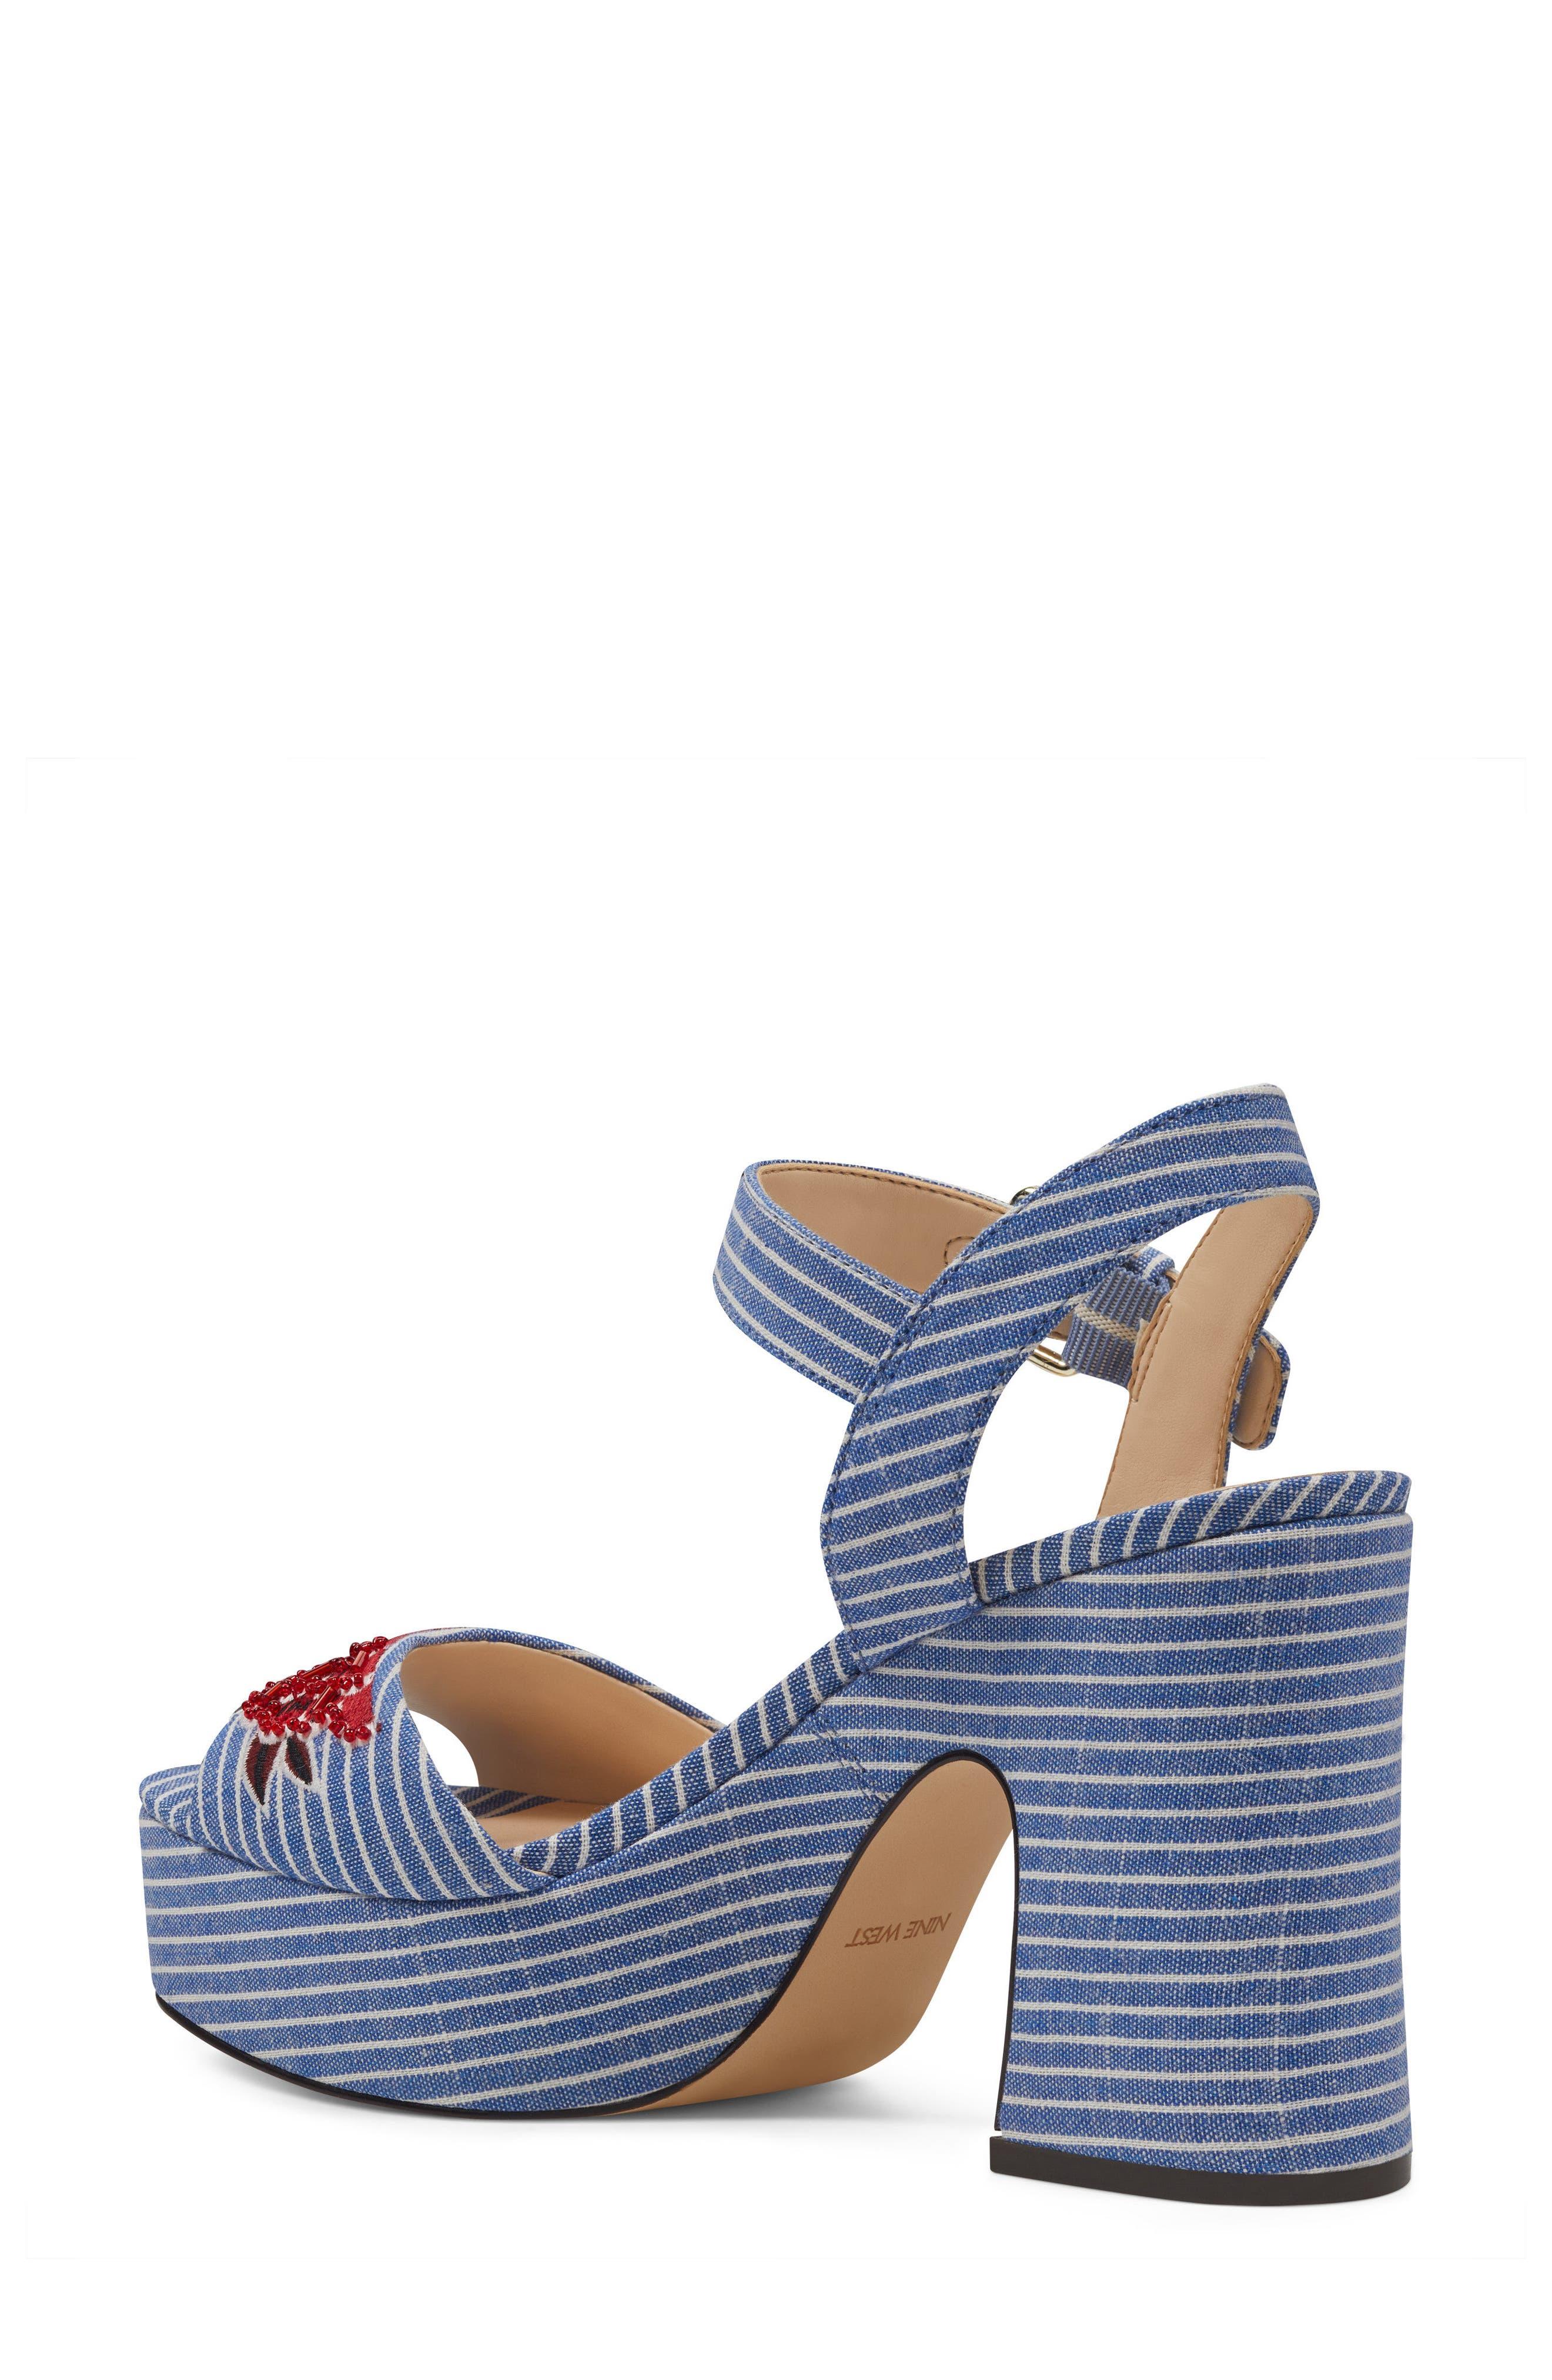 Fontayah Platform Sandal,                             Alternate thumbnail 2, color,                             Blue/ White Fabric